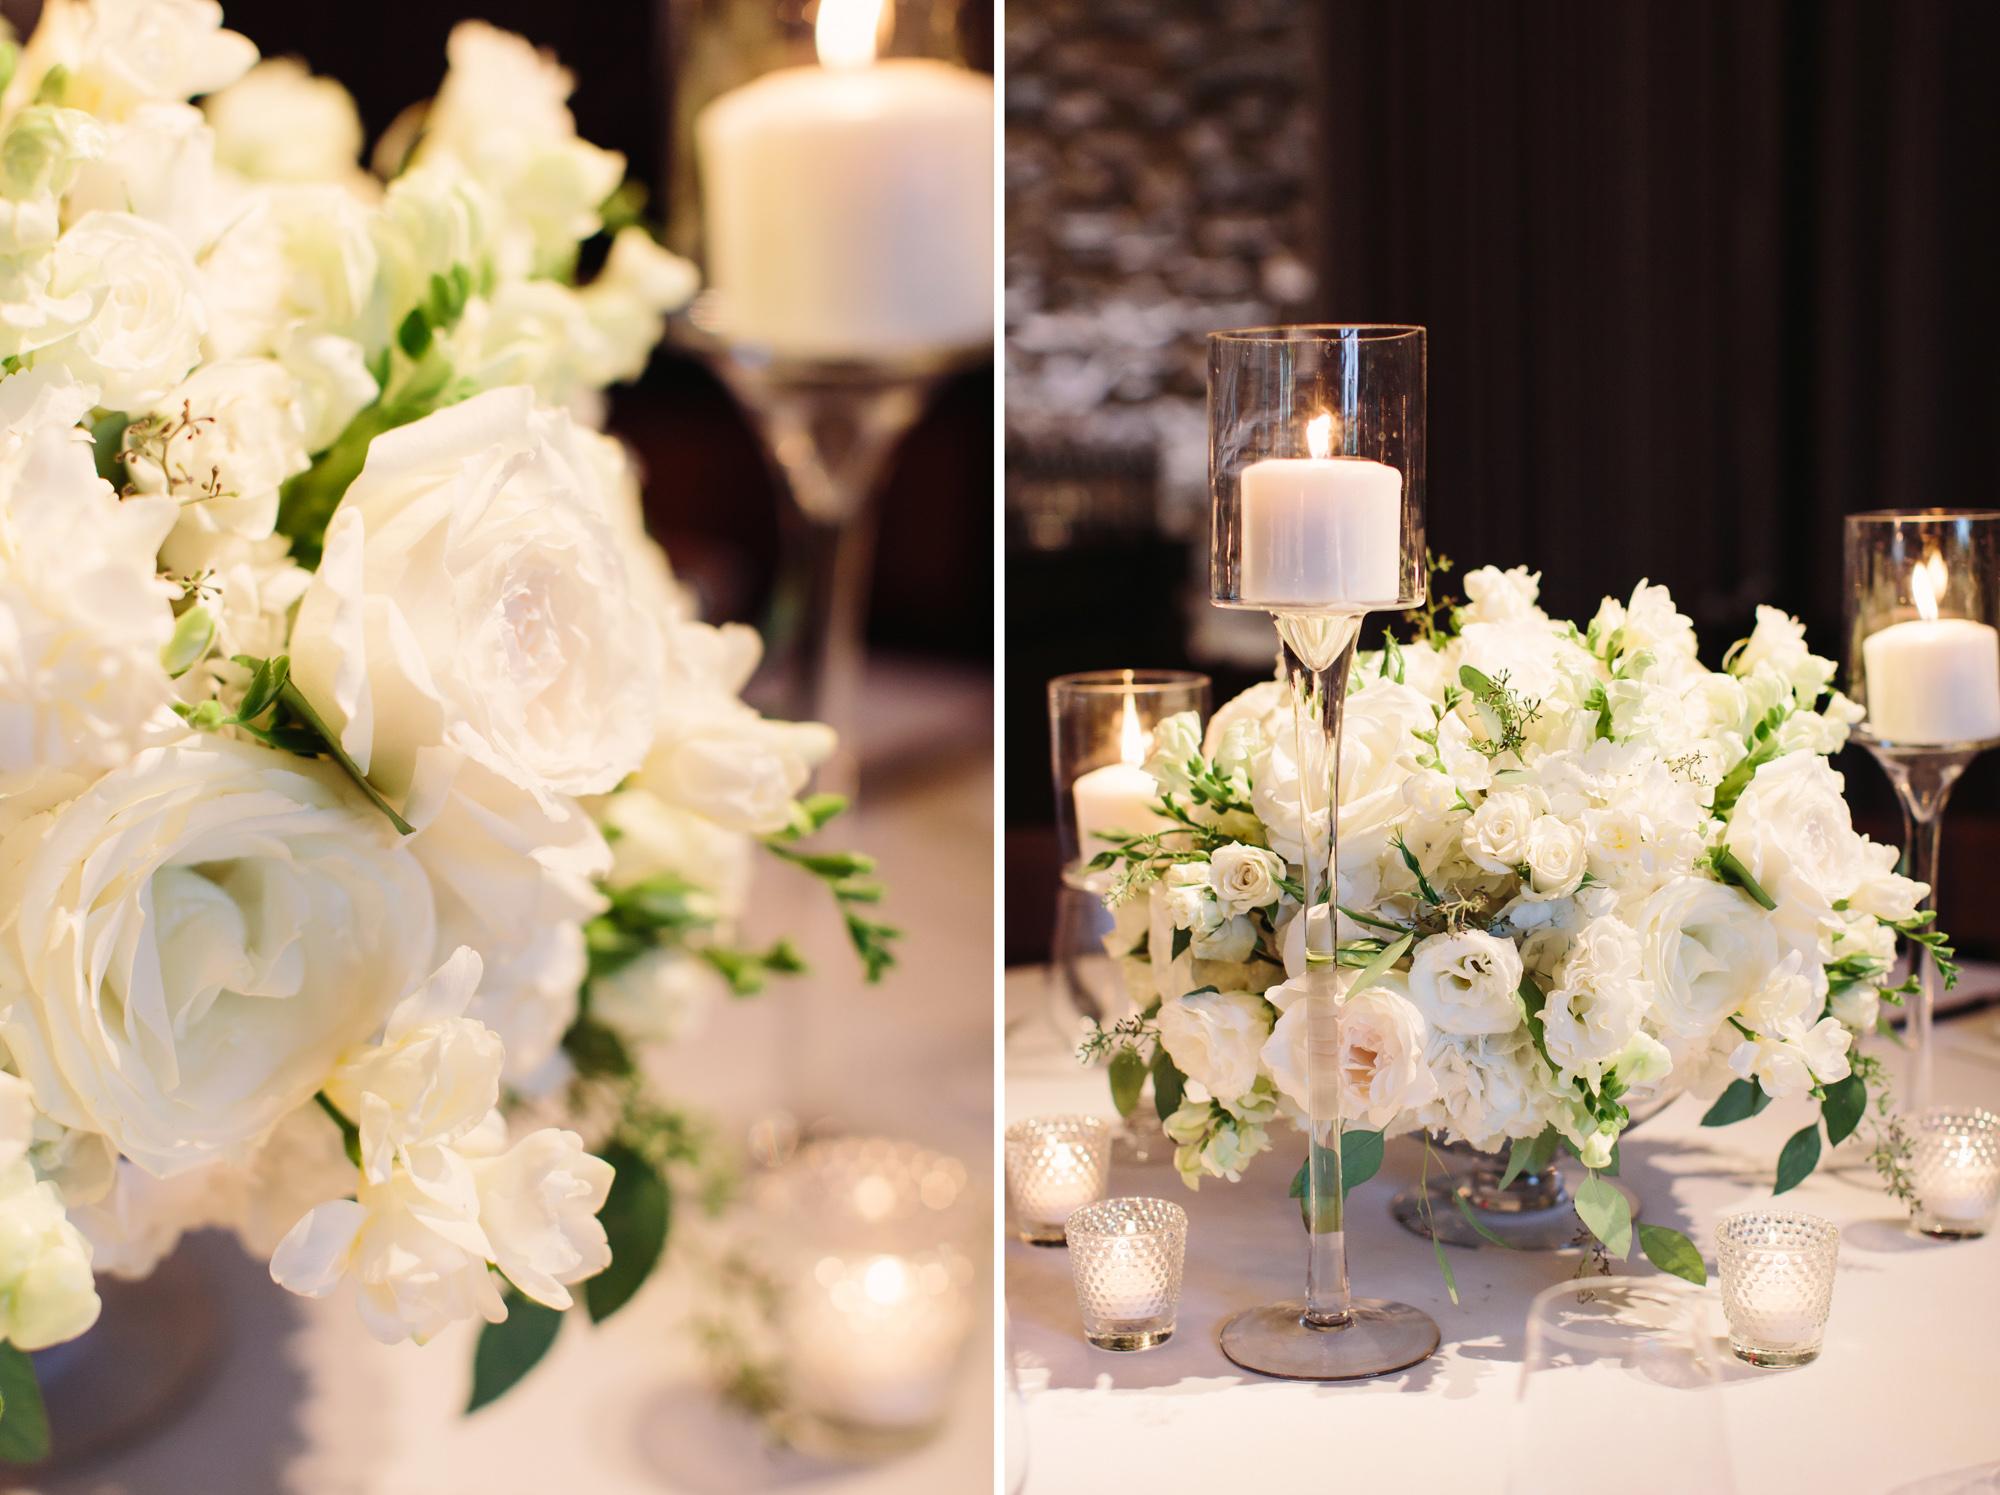 56_Jessica_Ted_Blue_Hill_Stone_Barns_Wedding_Pocantico_NY_Tanya_Salazar_Photography.jpg